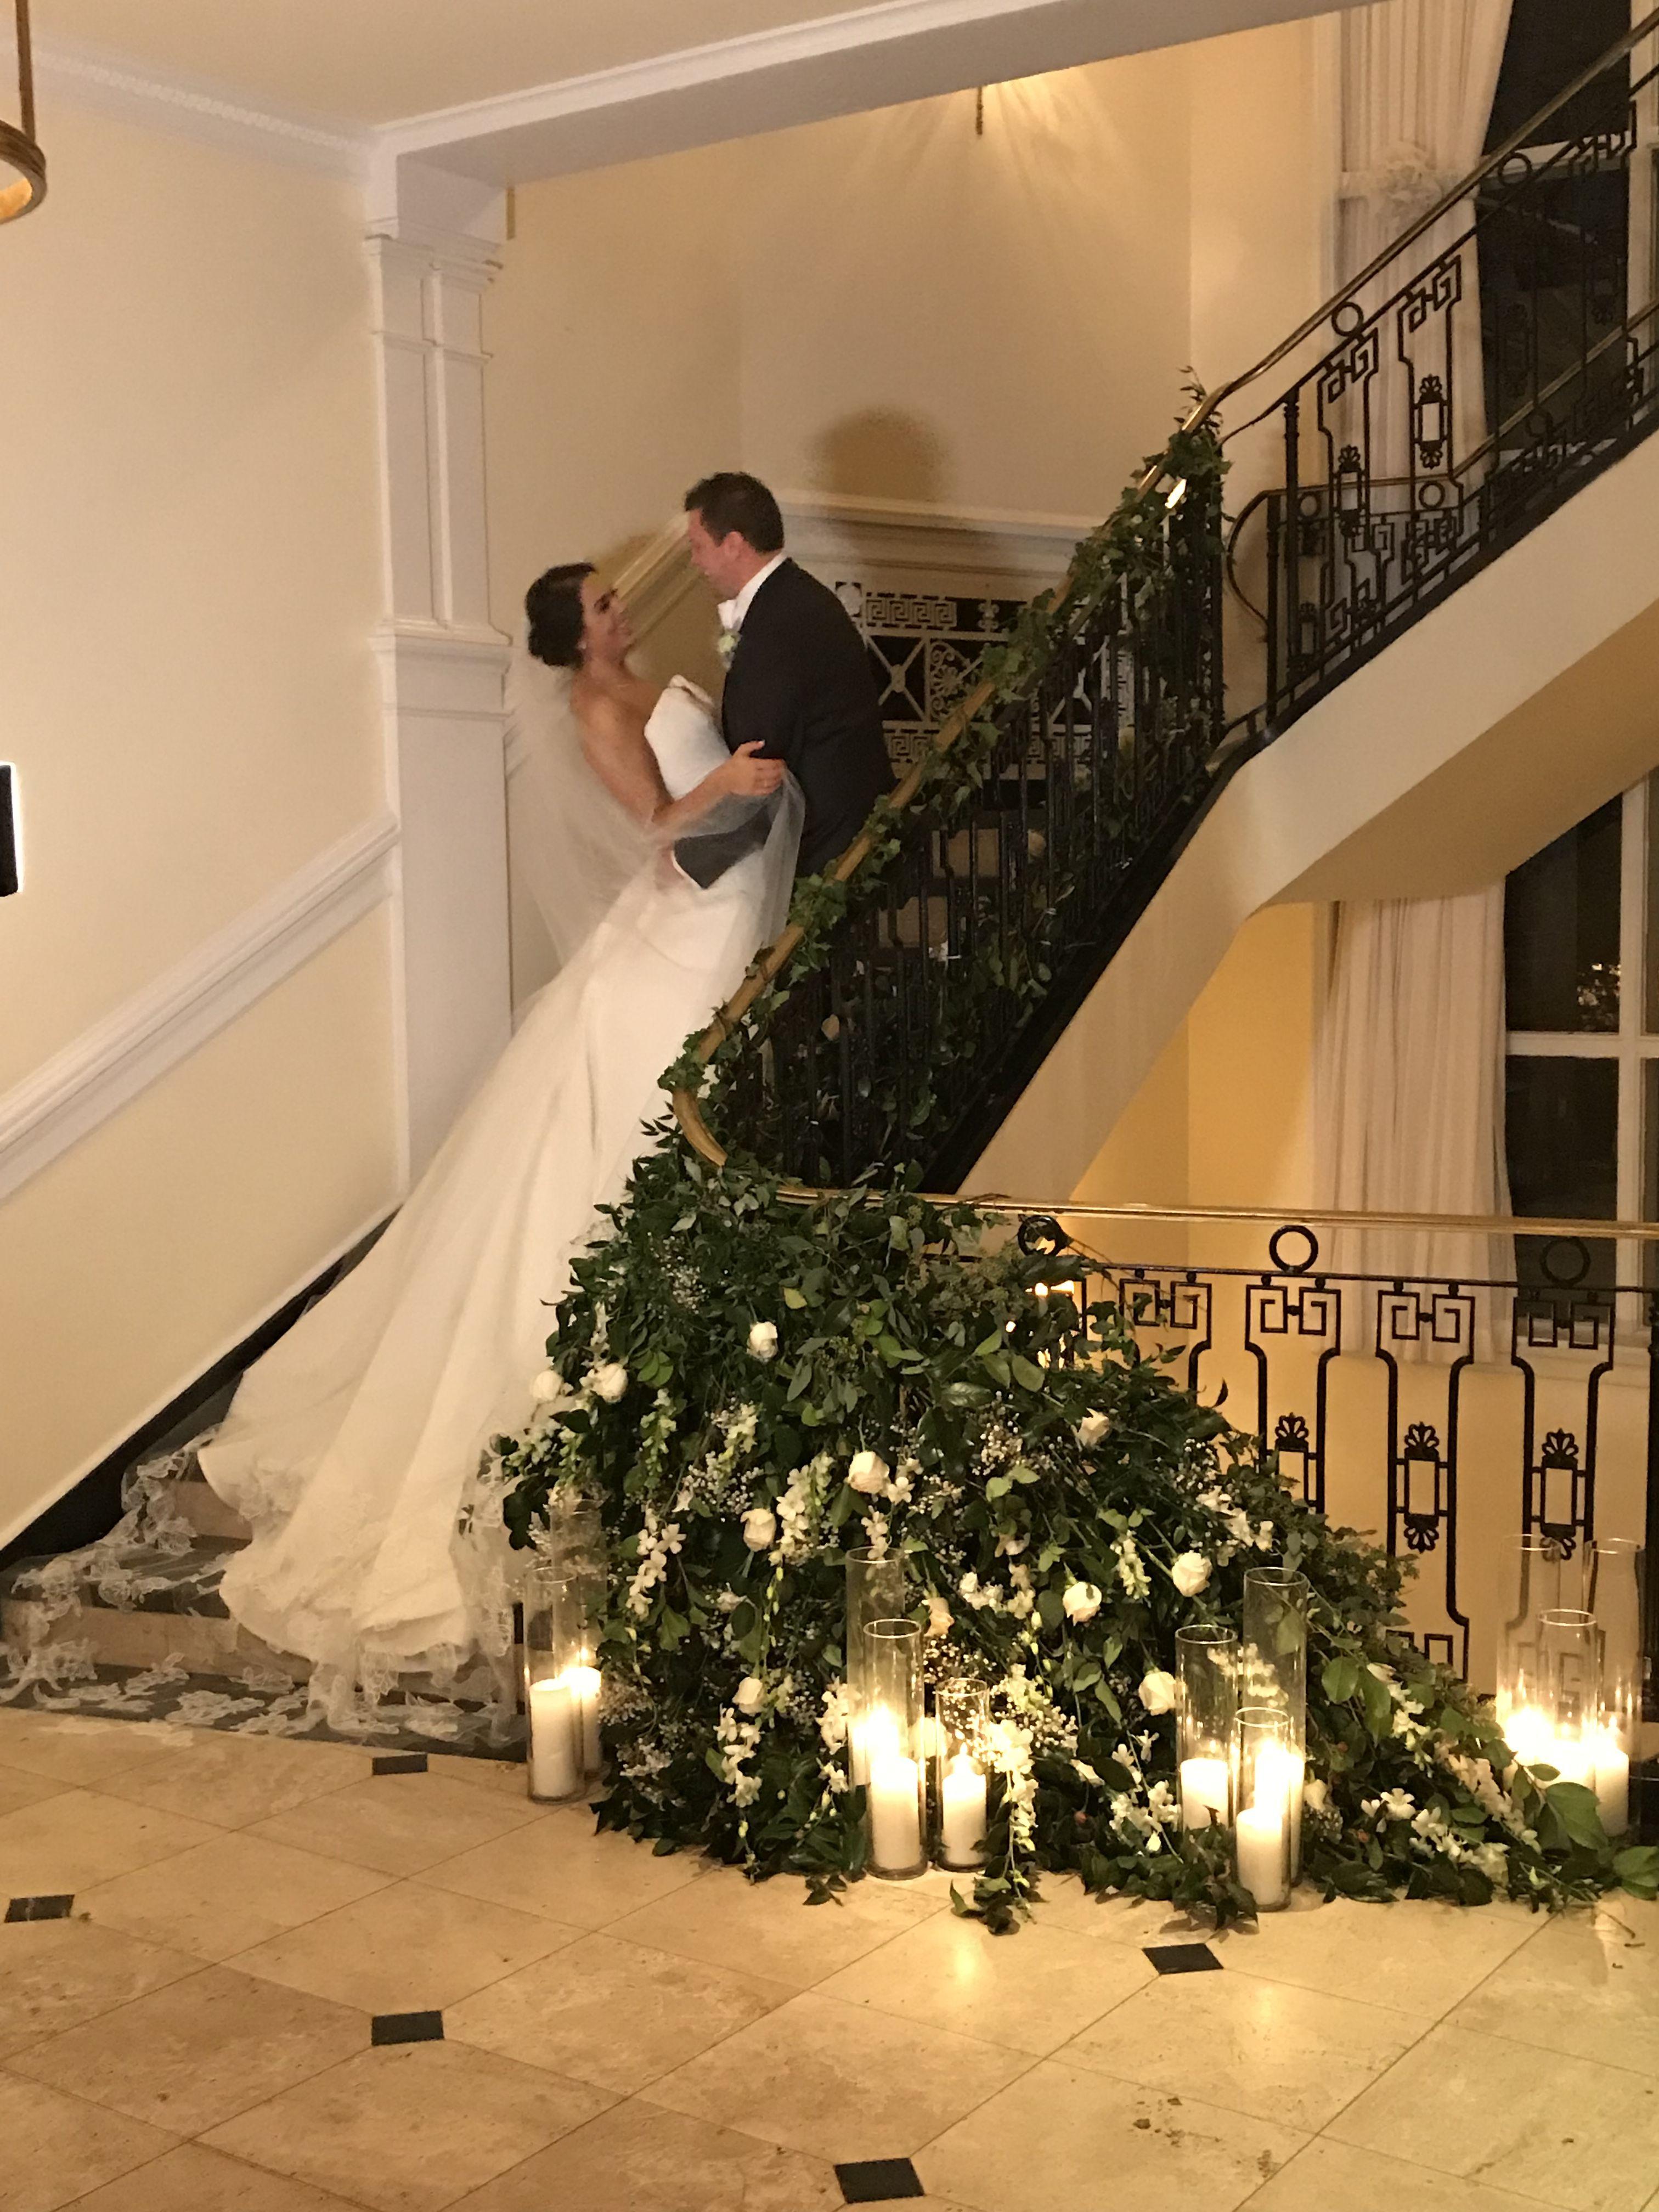 Long Island Ny The Carltun Wedding Bride Groom On Staircase In 2020 Long Island Wedding Wedding Bride New York Bride